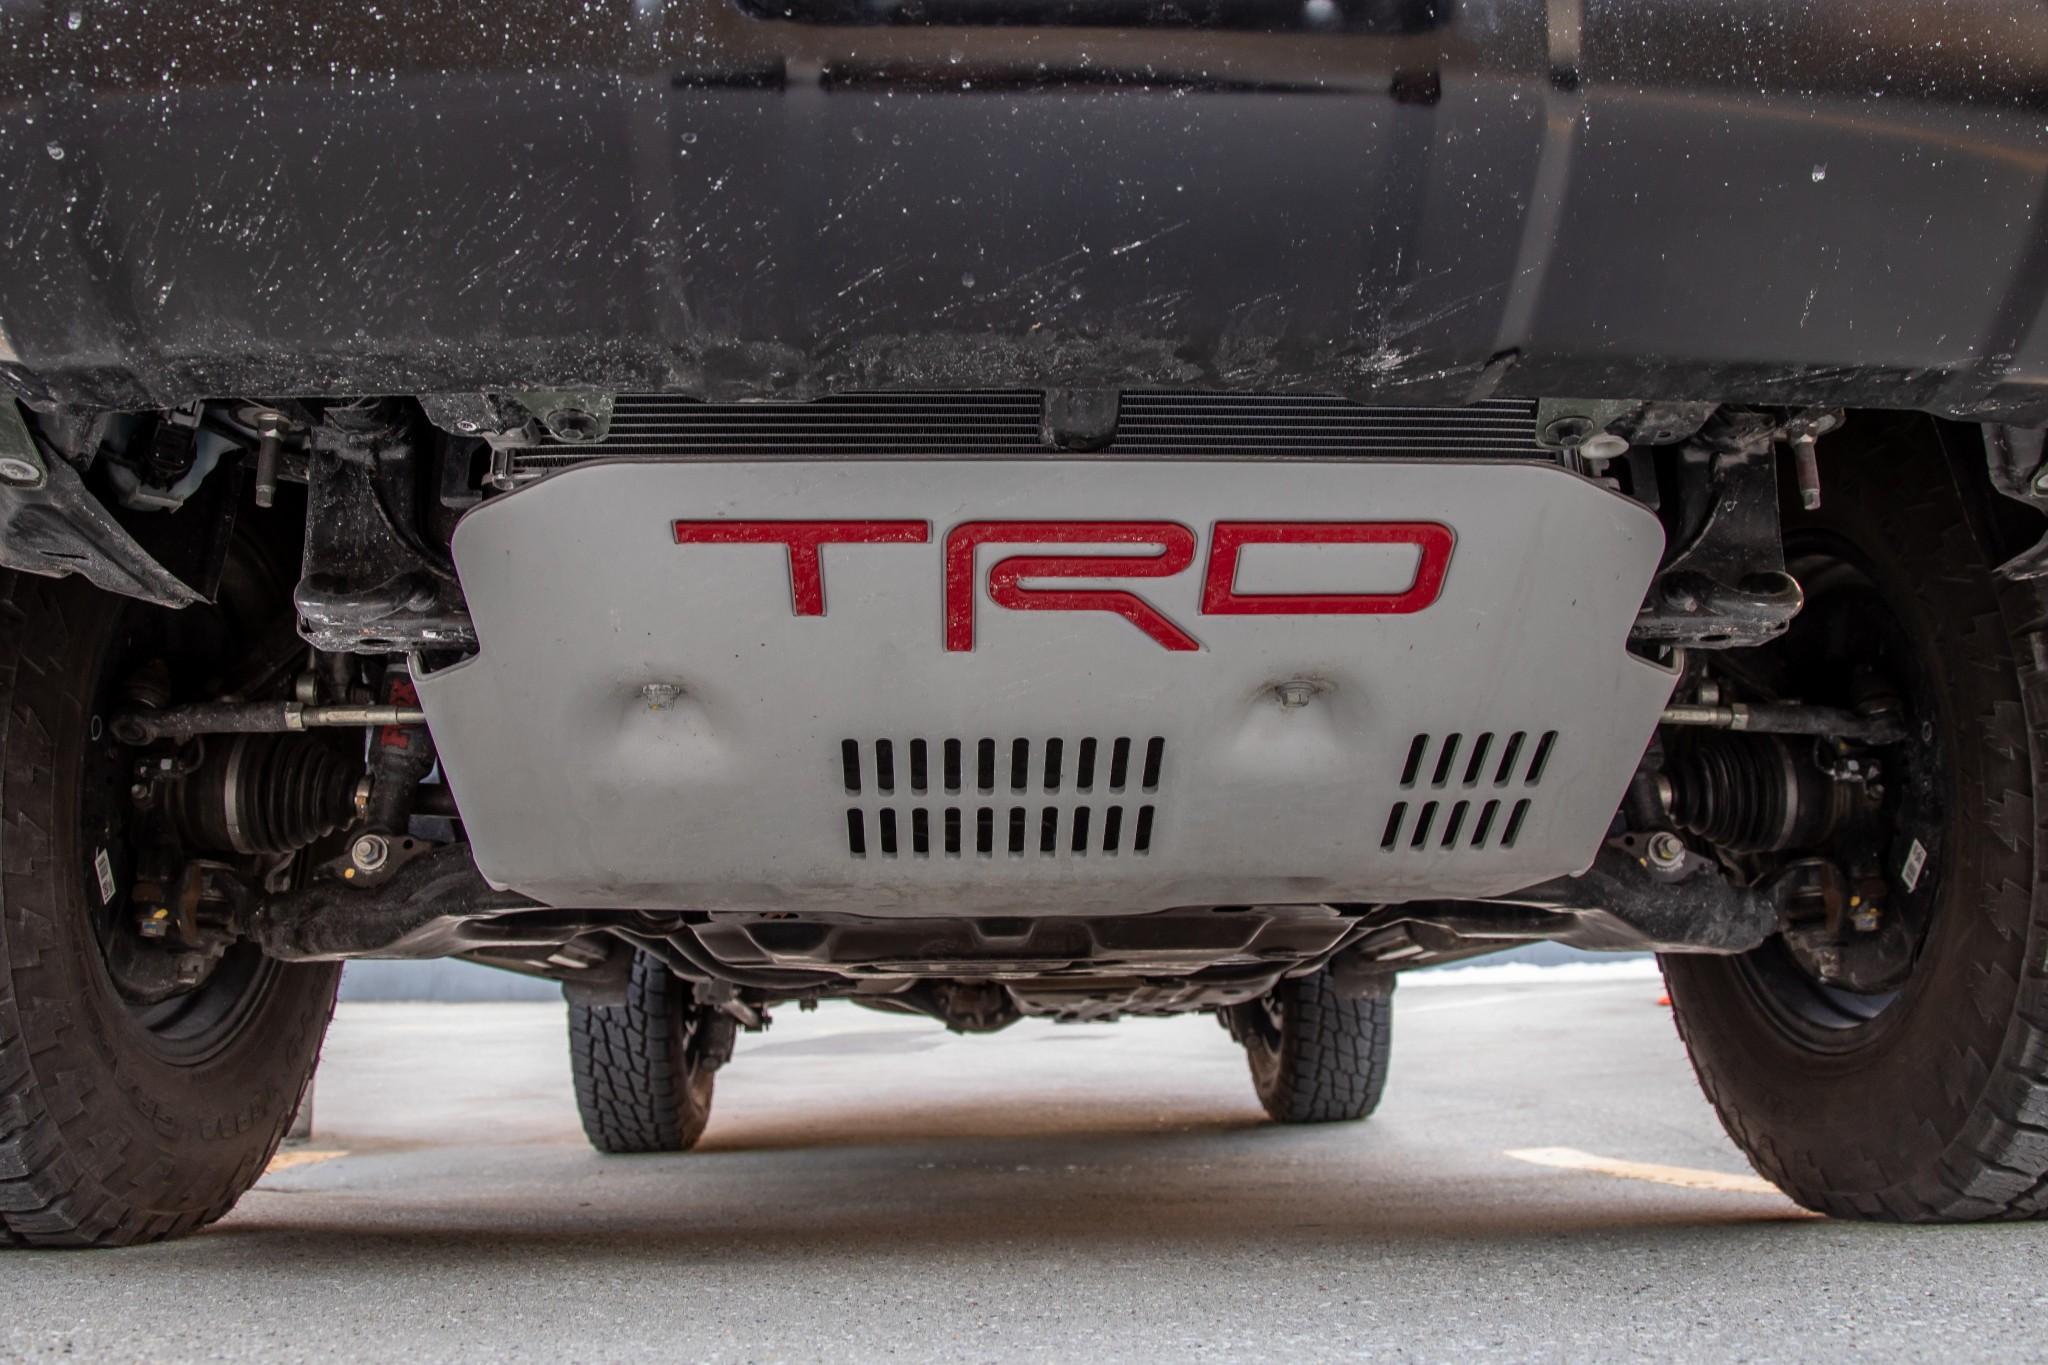 4runner-trd-pro-exterior--green--skid-plate--undercarriage-33.jpg